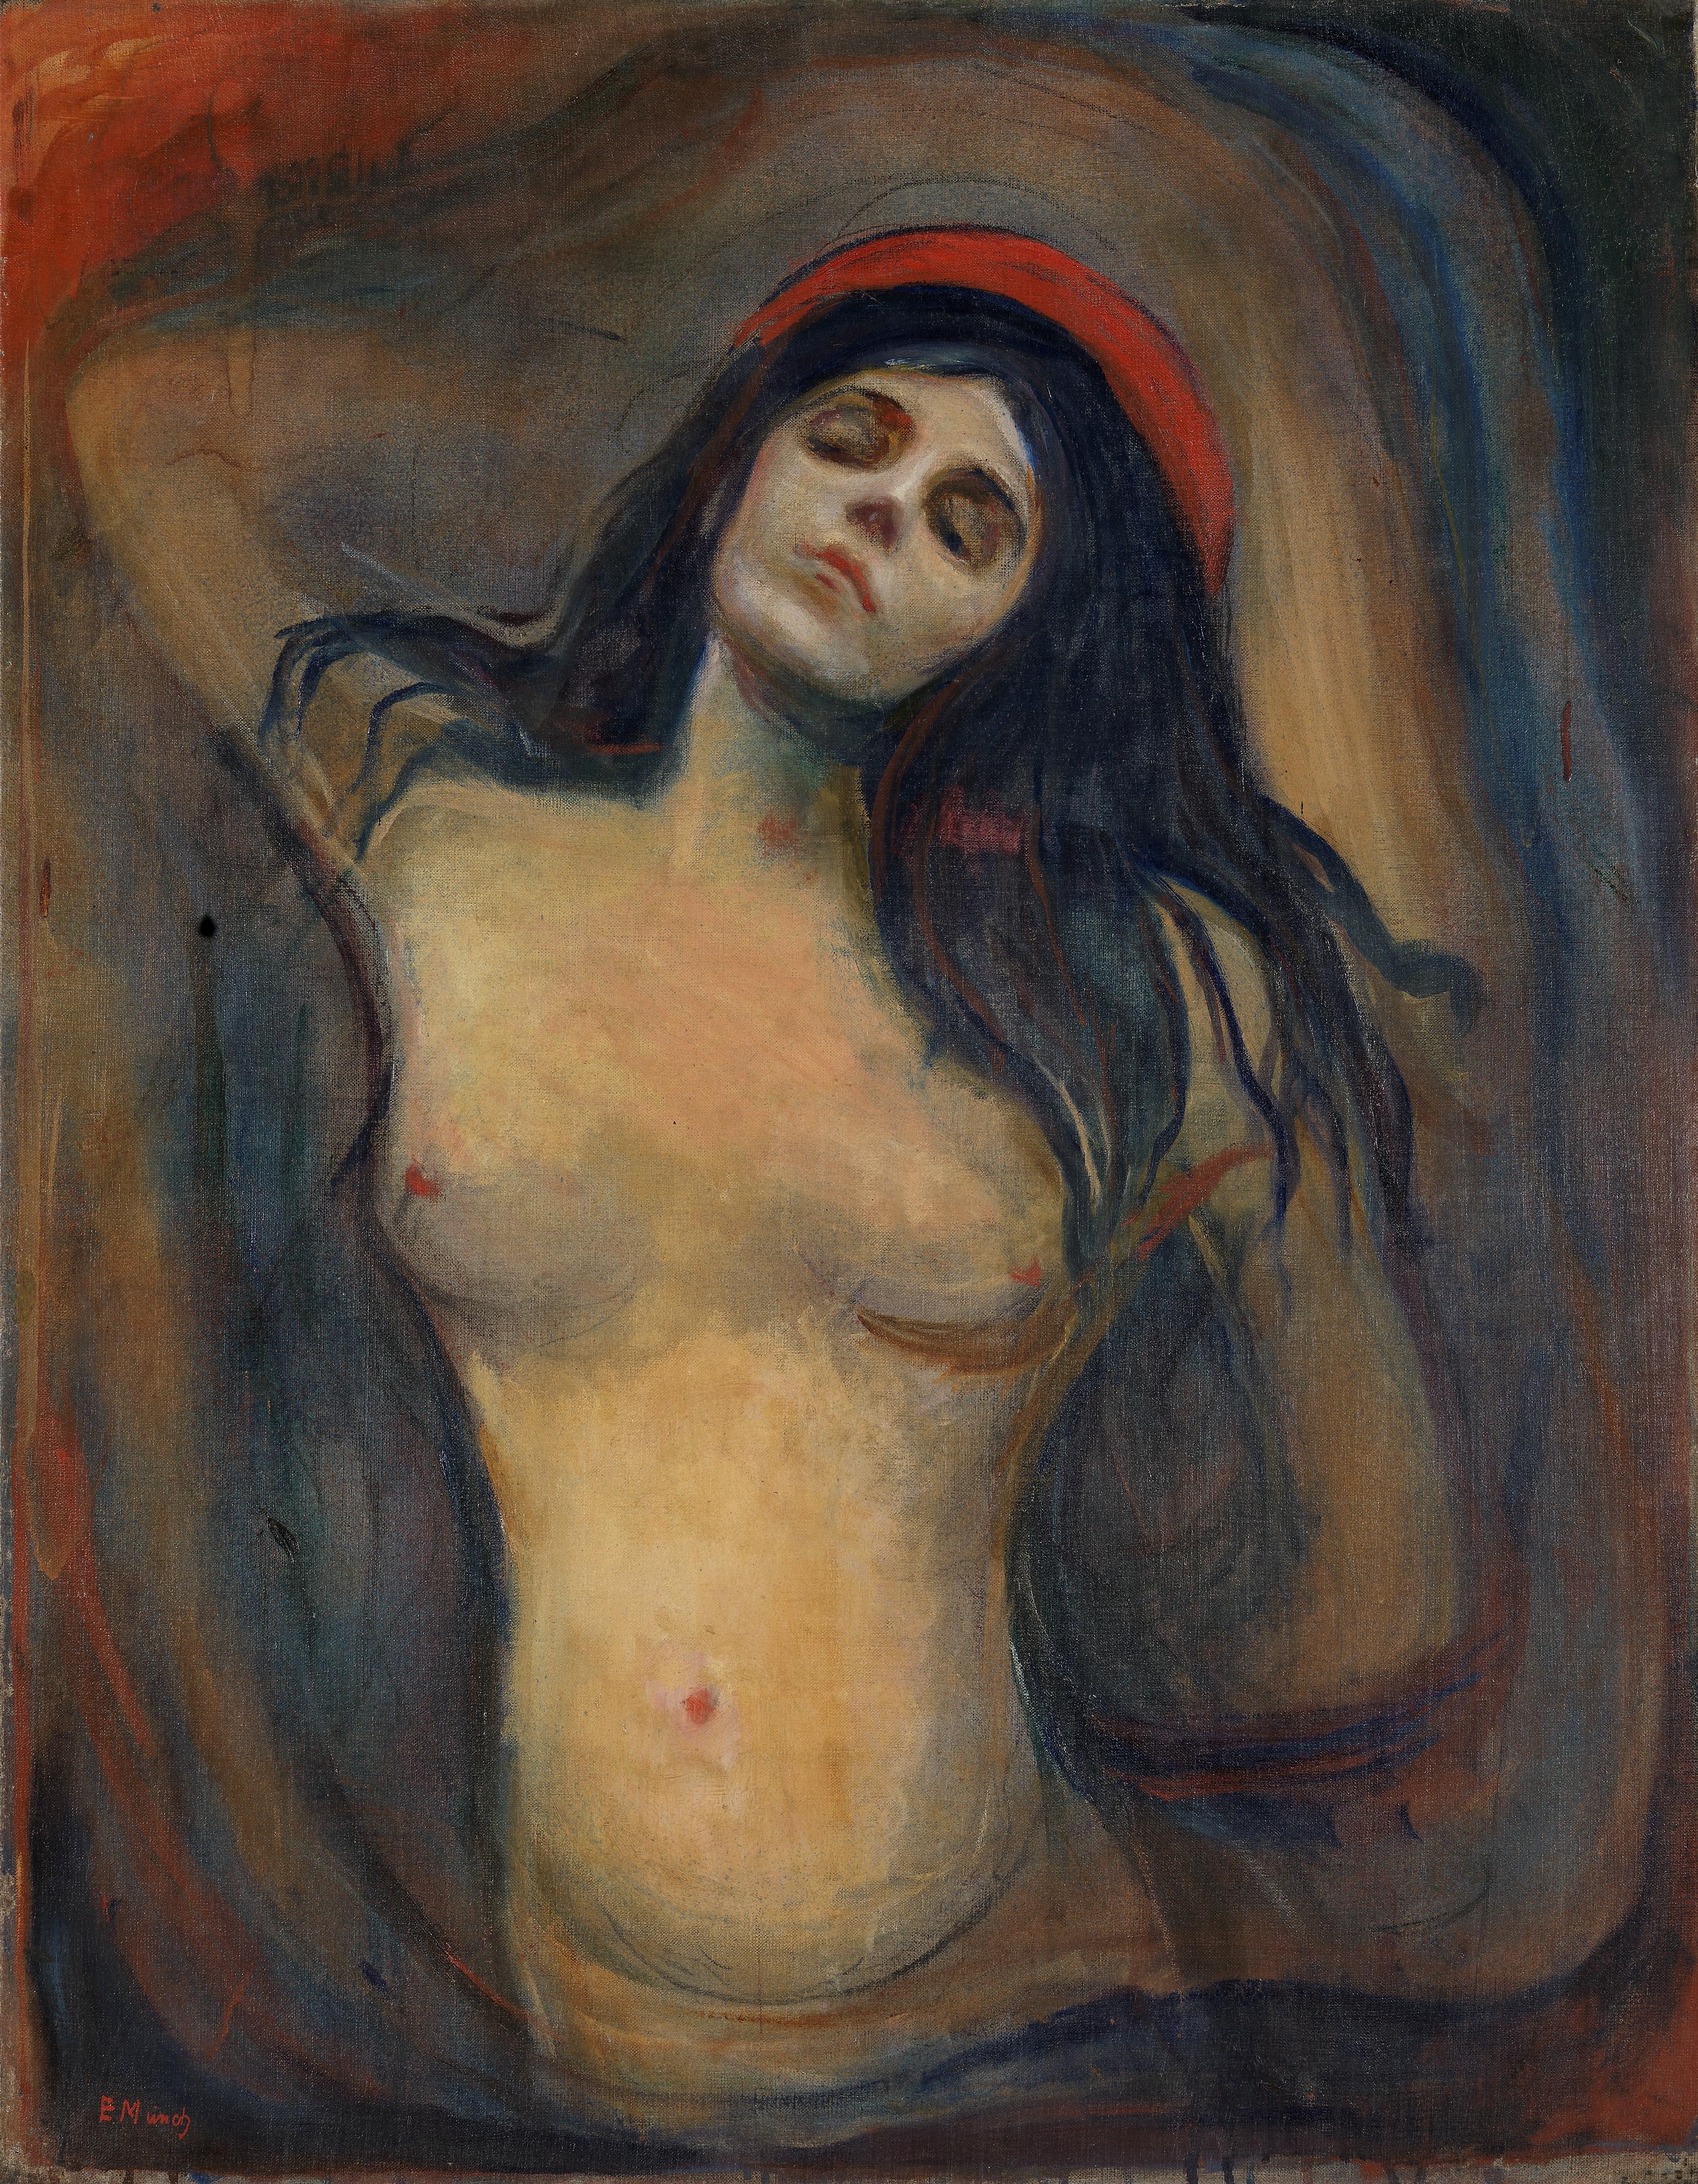 Edvard Munch - Madonna - 1894-1895, olio su tela, Munch Museum, Oslo